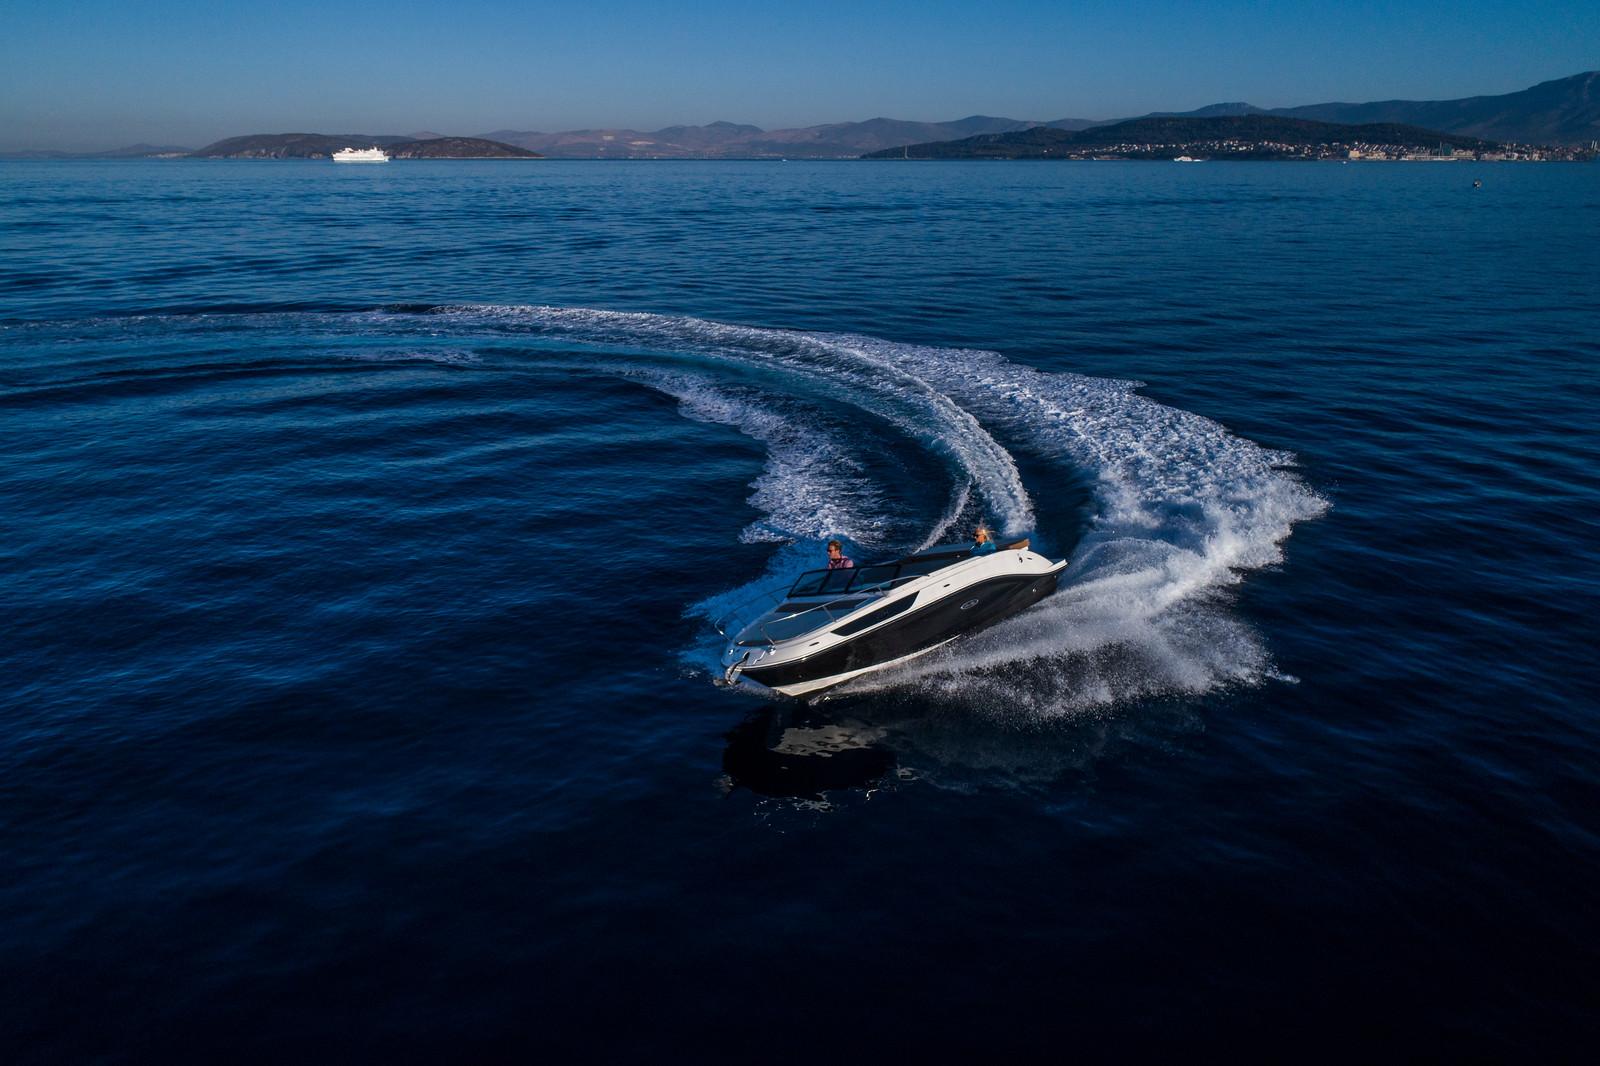 Sea Ray Sun Sport 230 Outboard Cuddy Cabin full